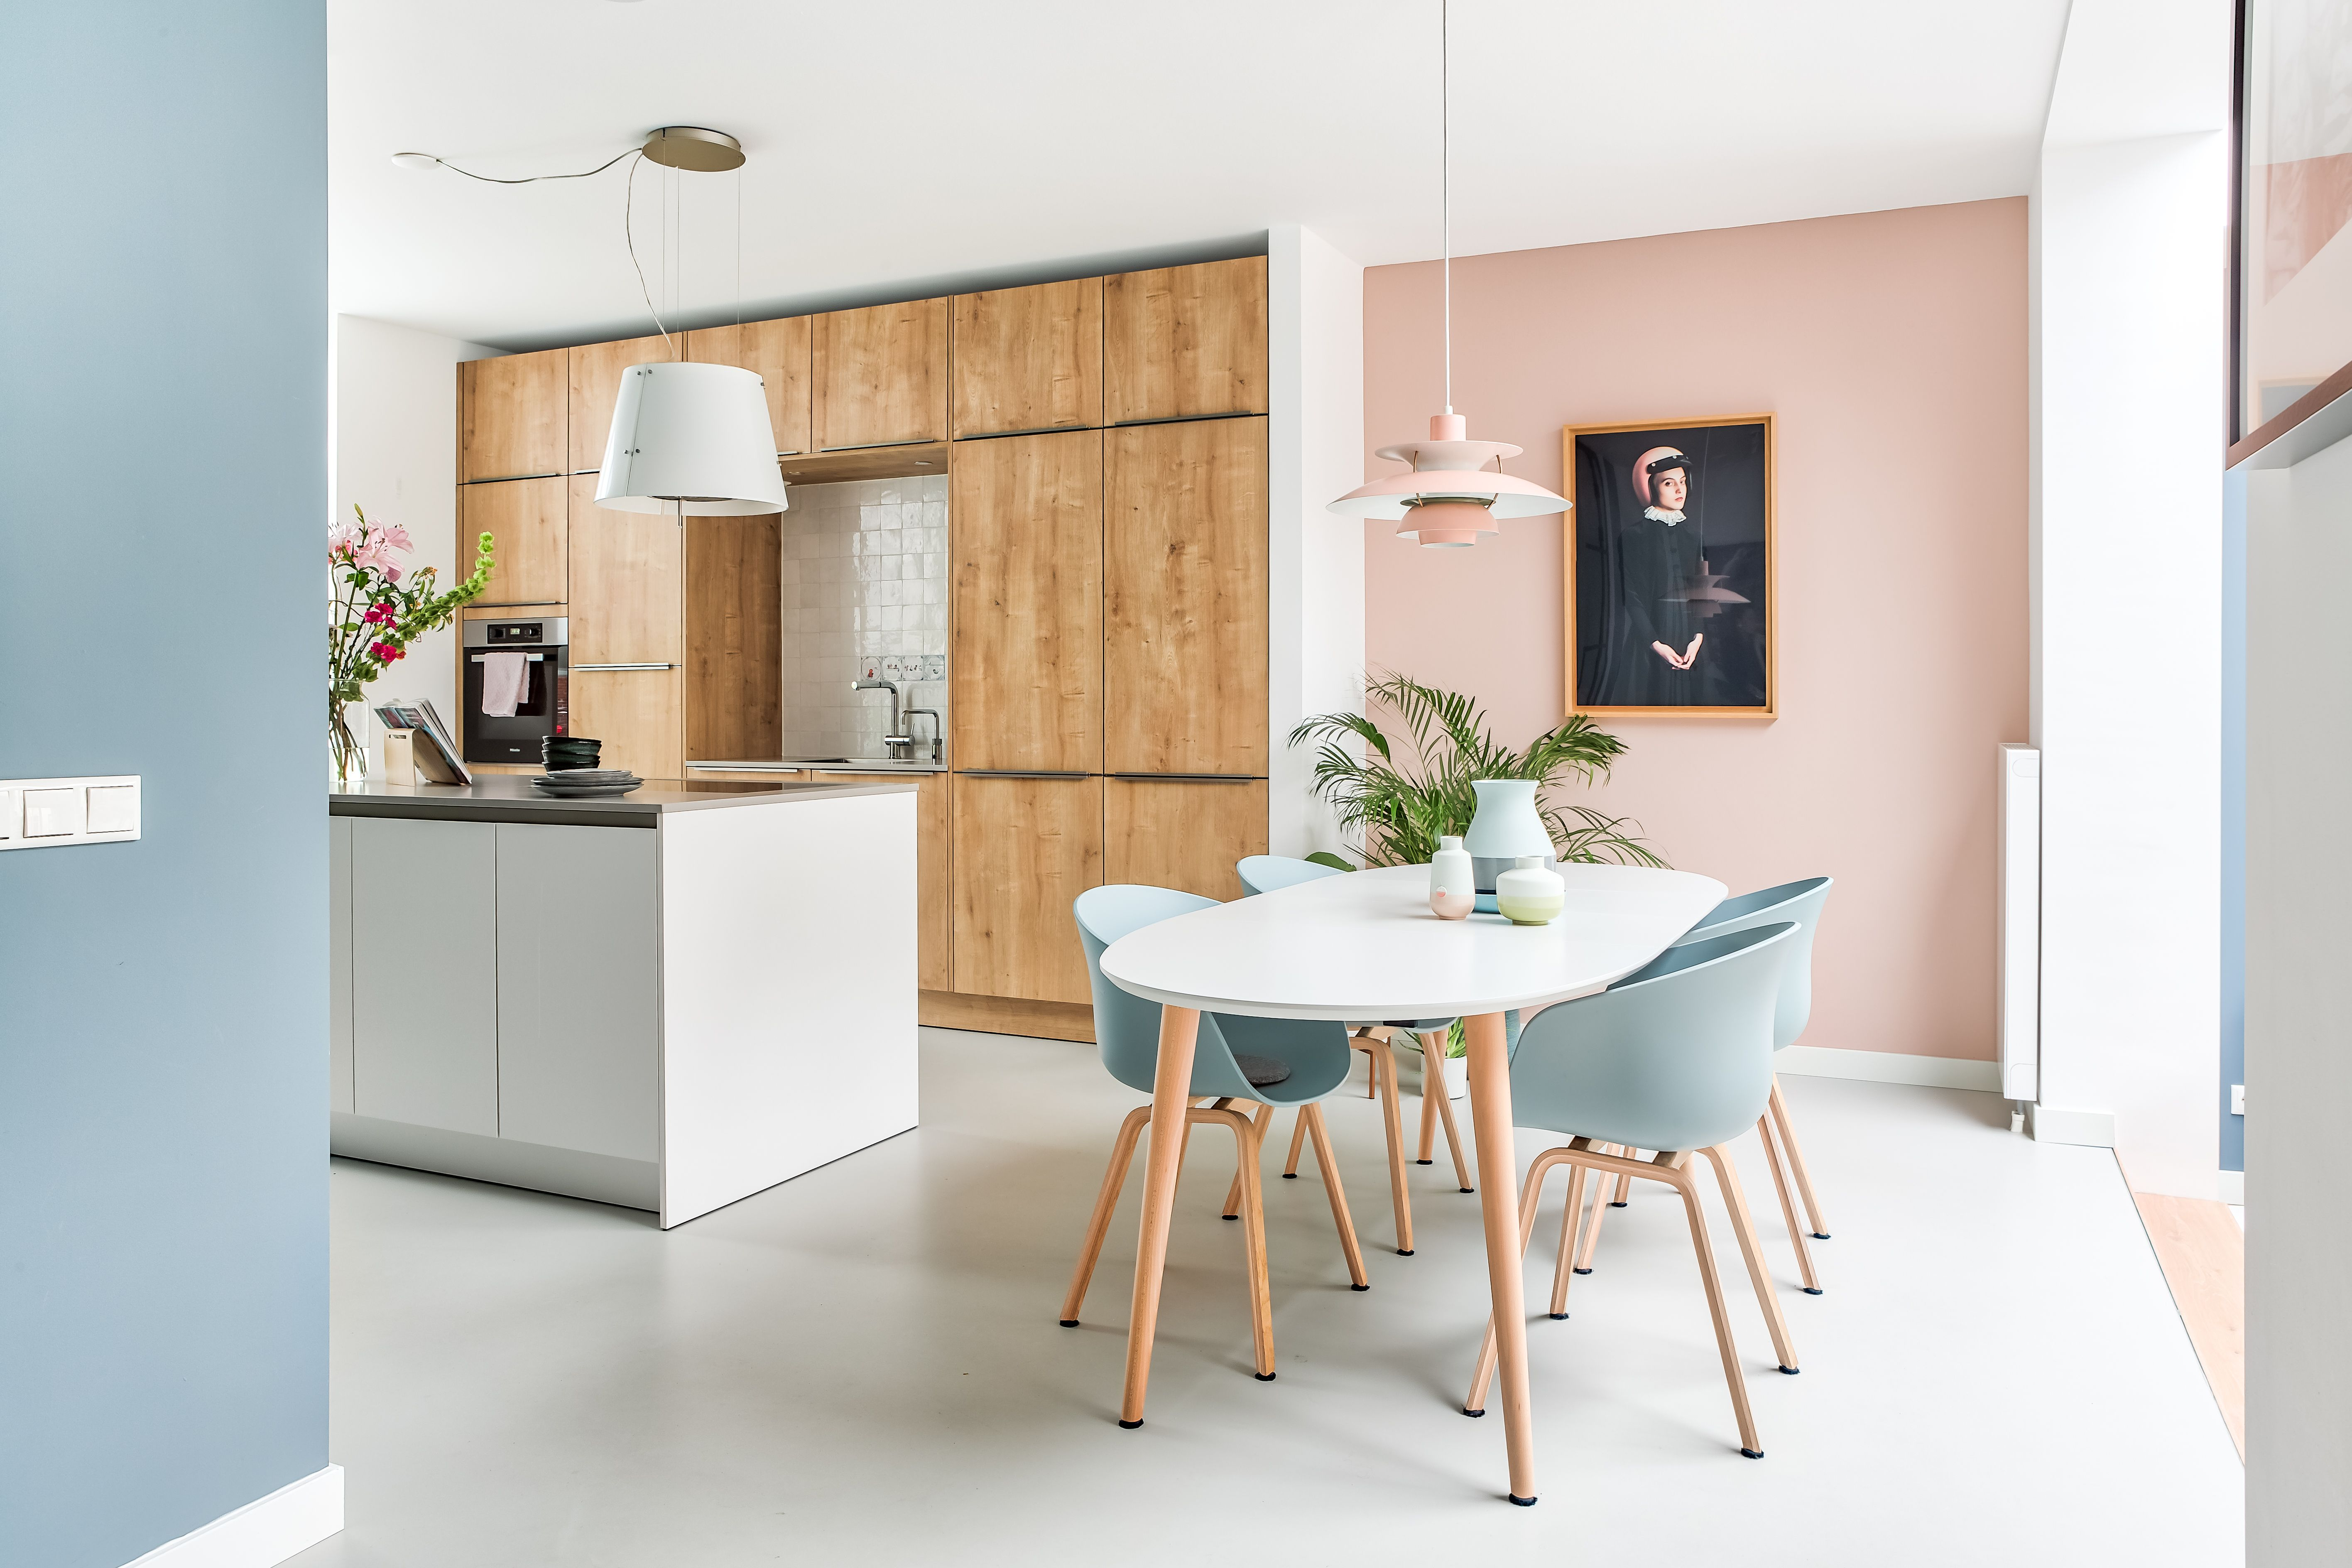 Studio Binnen Interior Design Portfolio Project Utrecht